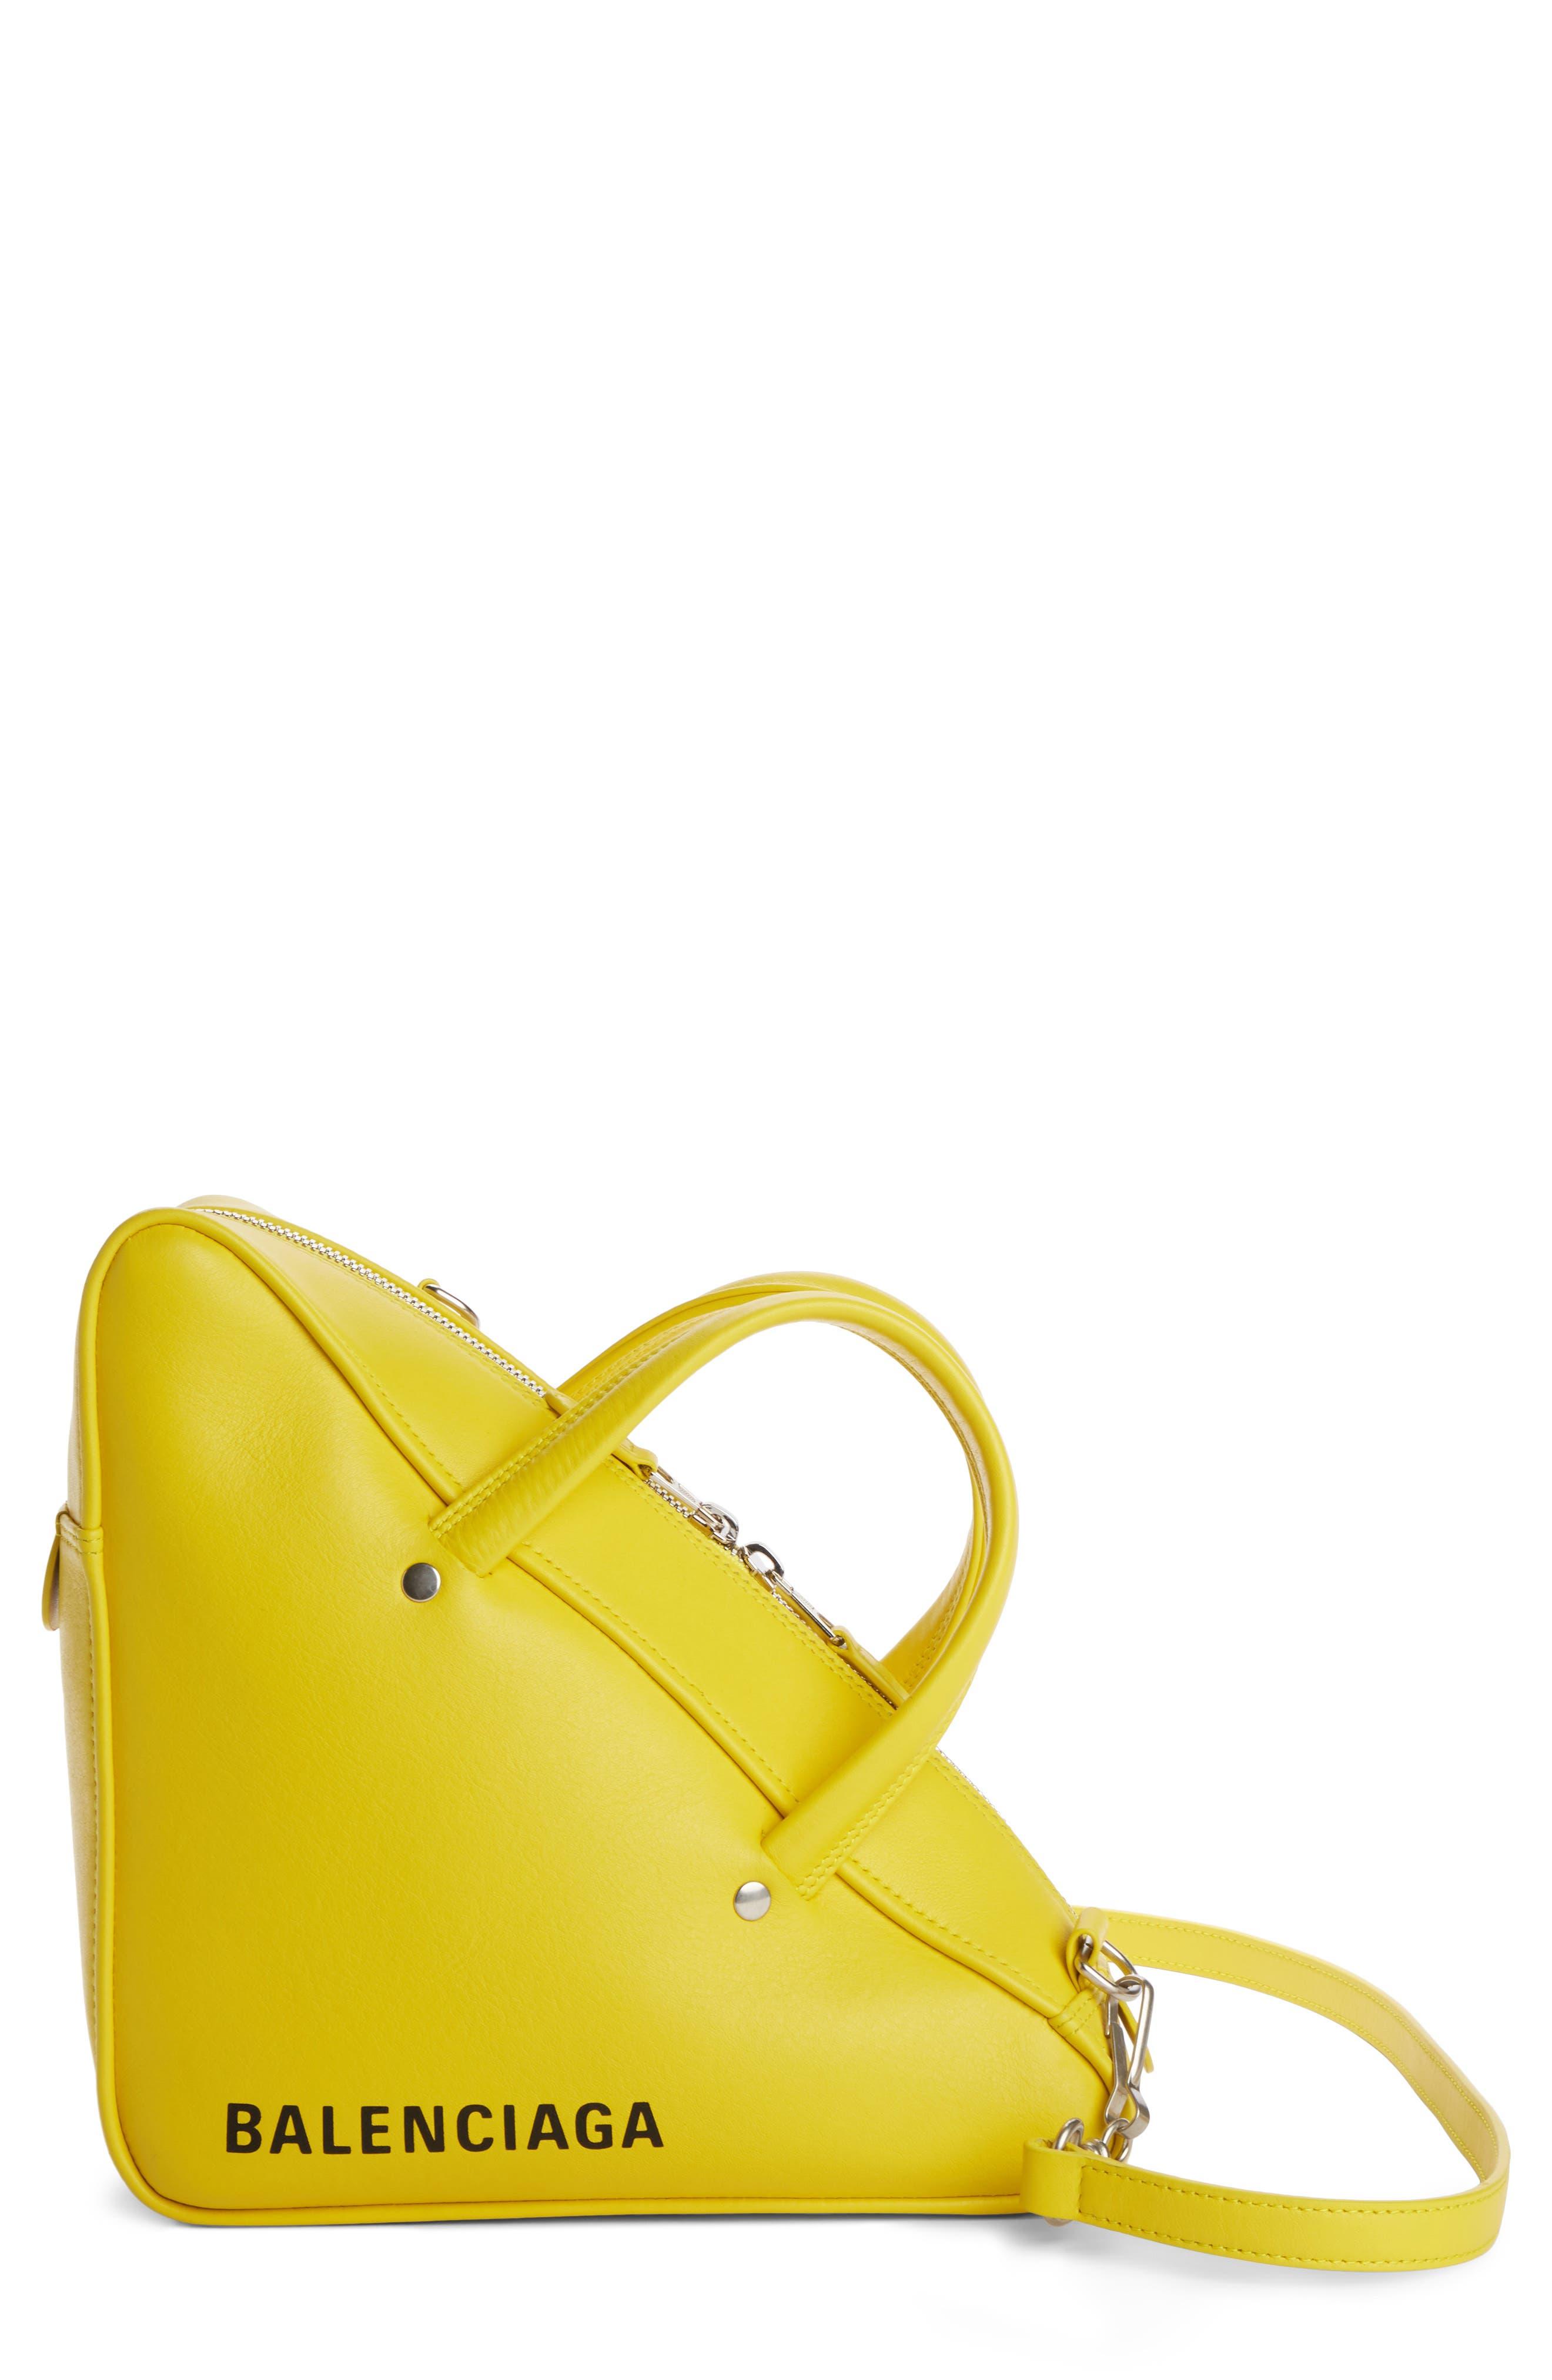 Small Triangle Duffel Bag,                             Main thumbnail 1, color,                             Jaune